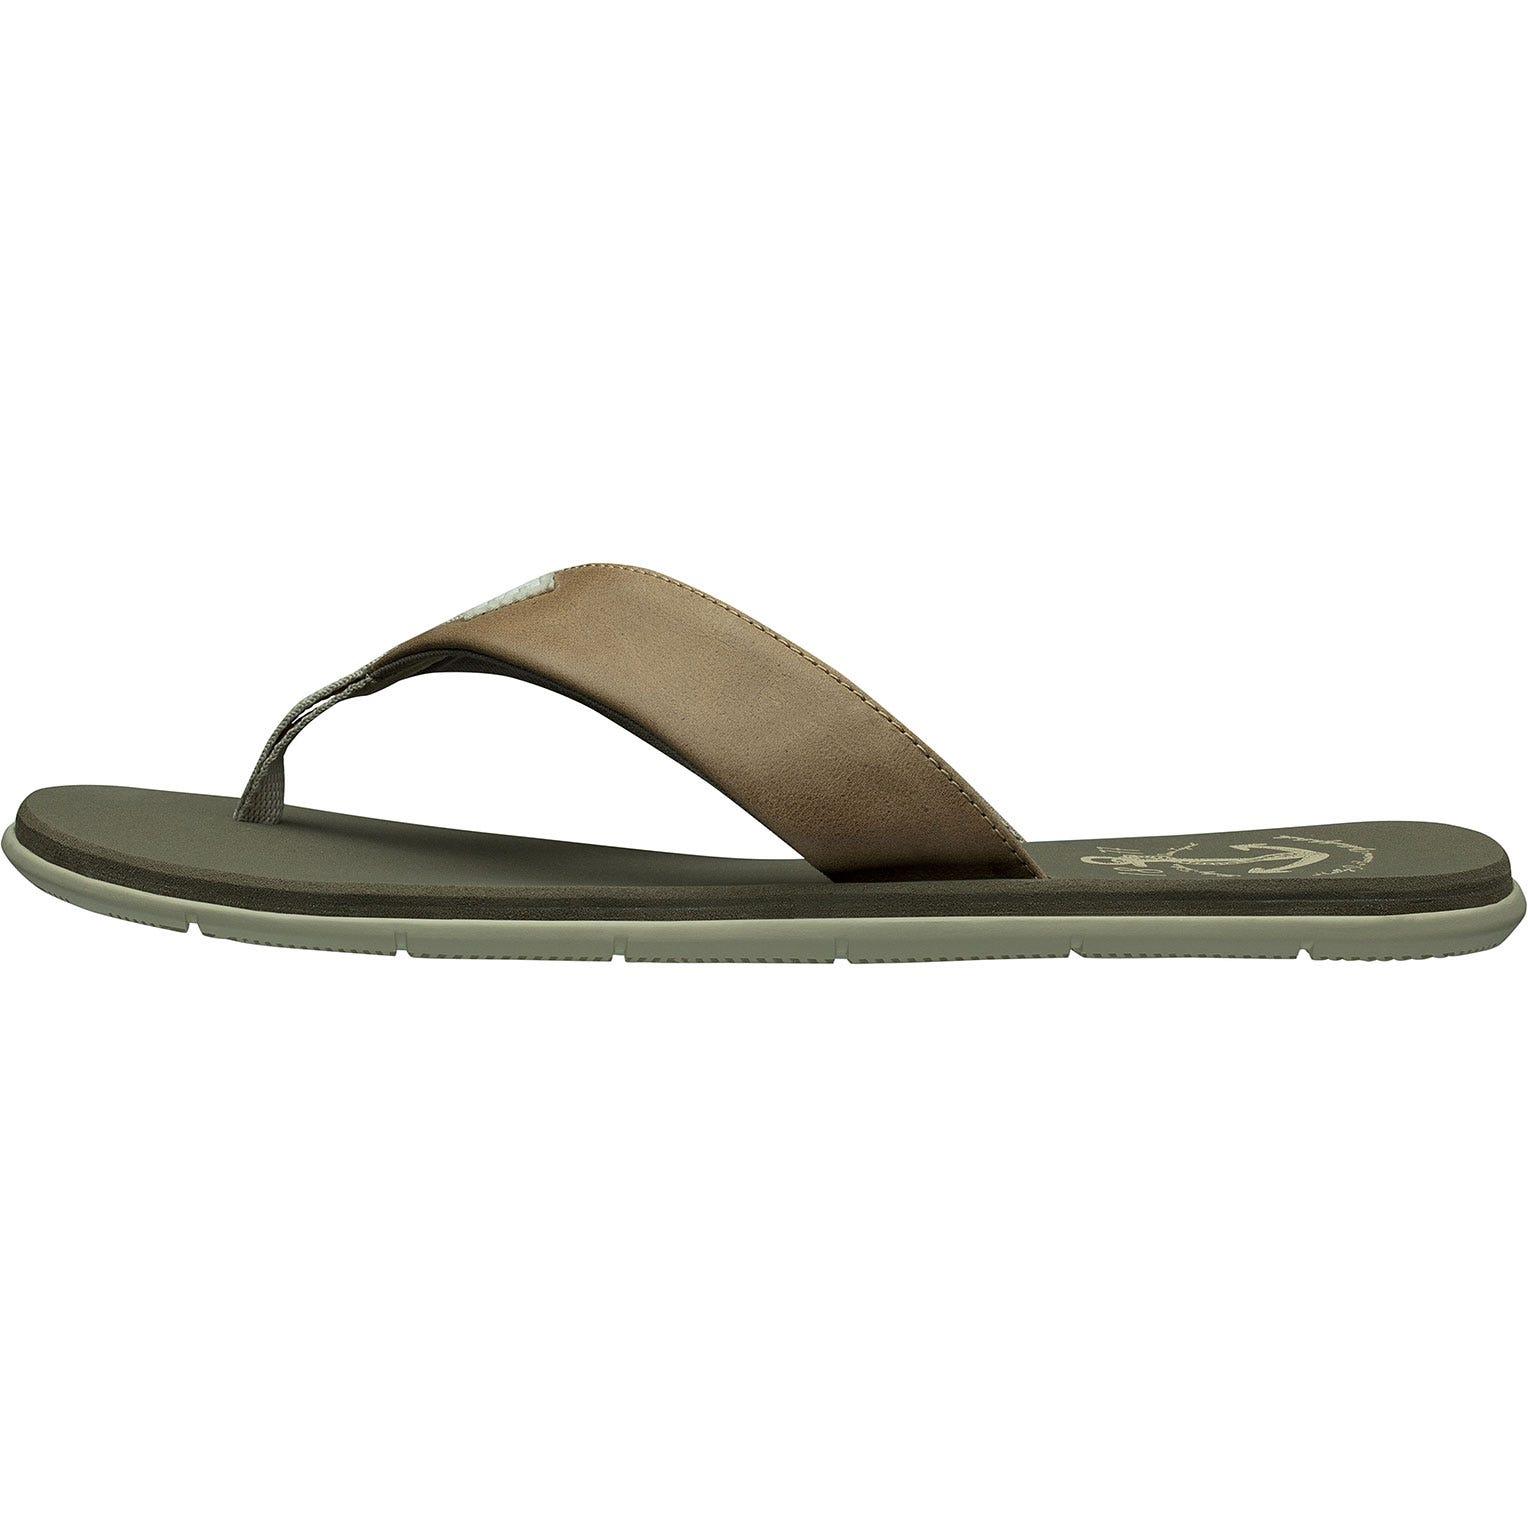 Helly Hansen Seasand Leather Sandal Mens Beige 42.5/9